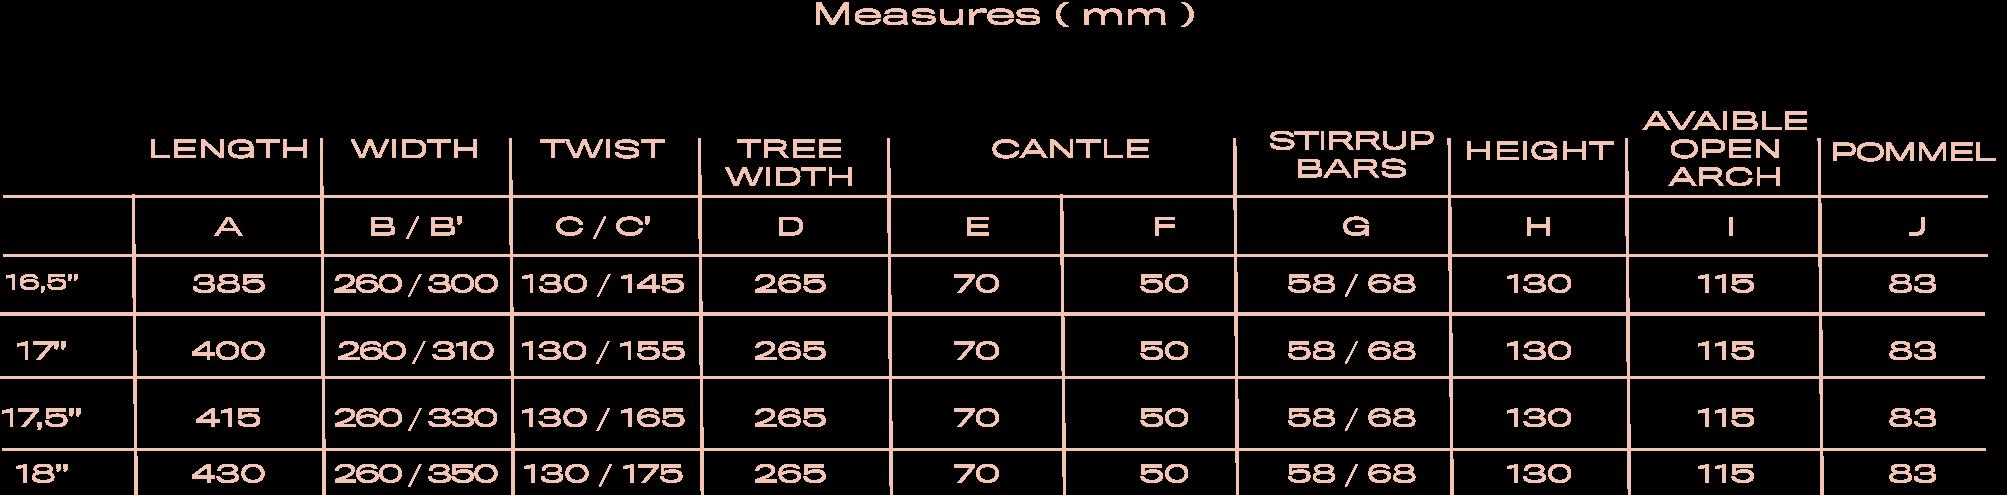 366-measures-portarit-graph-profine-horse-saddlery-argentina-trees-02-03-03-04-05